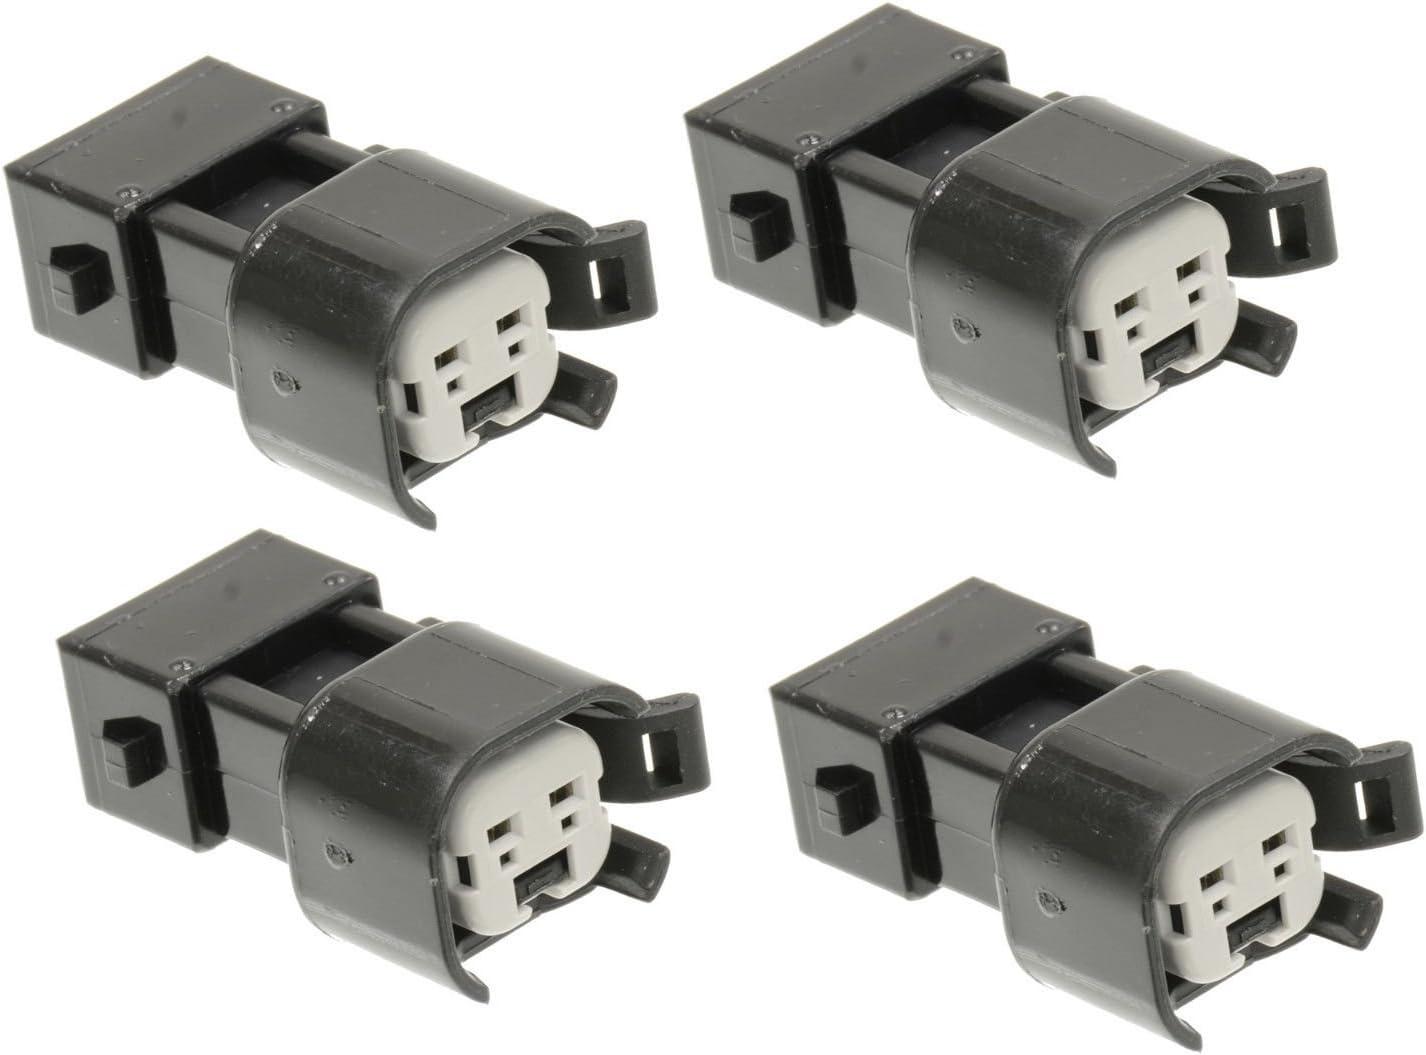 LS1 EV1 to EV6 EV14 USCAR LS2 LS3 LSX LT1 Fuel Injector Connector Adapter QTY 6